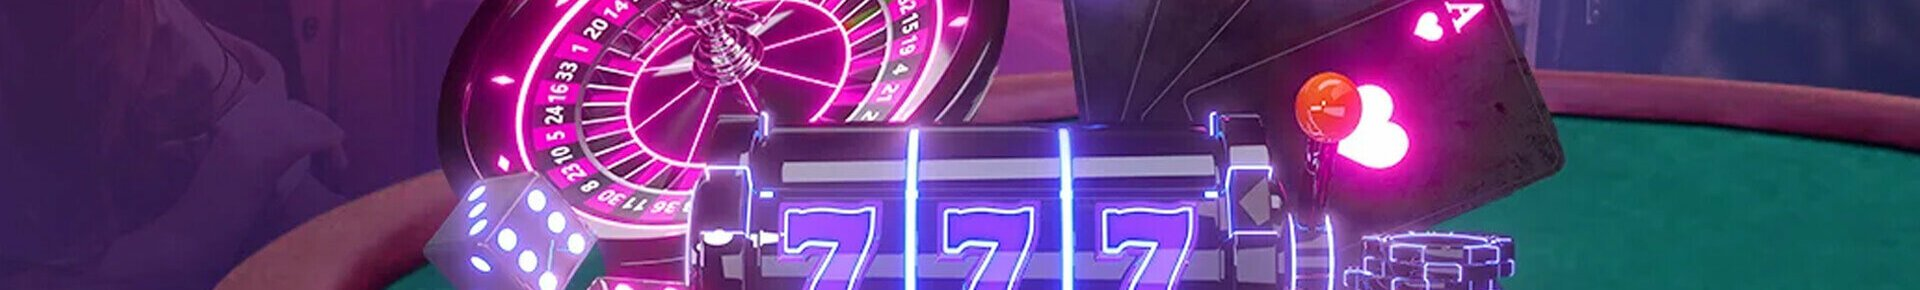 Betzest casino review CA